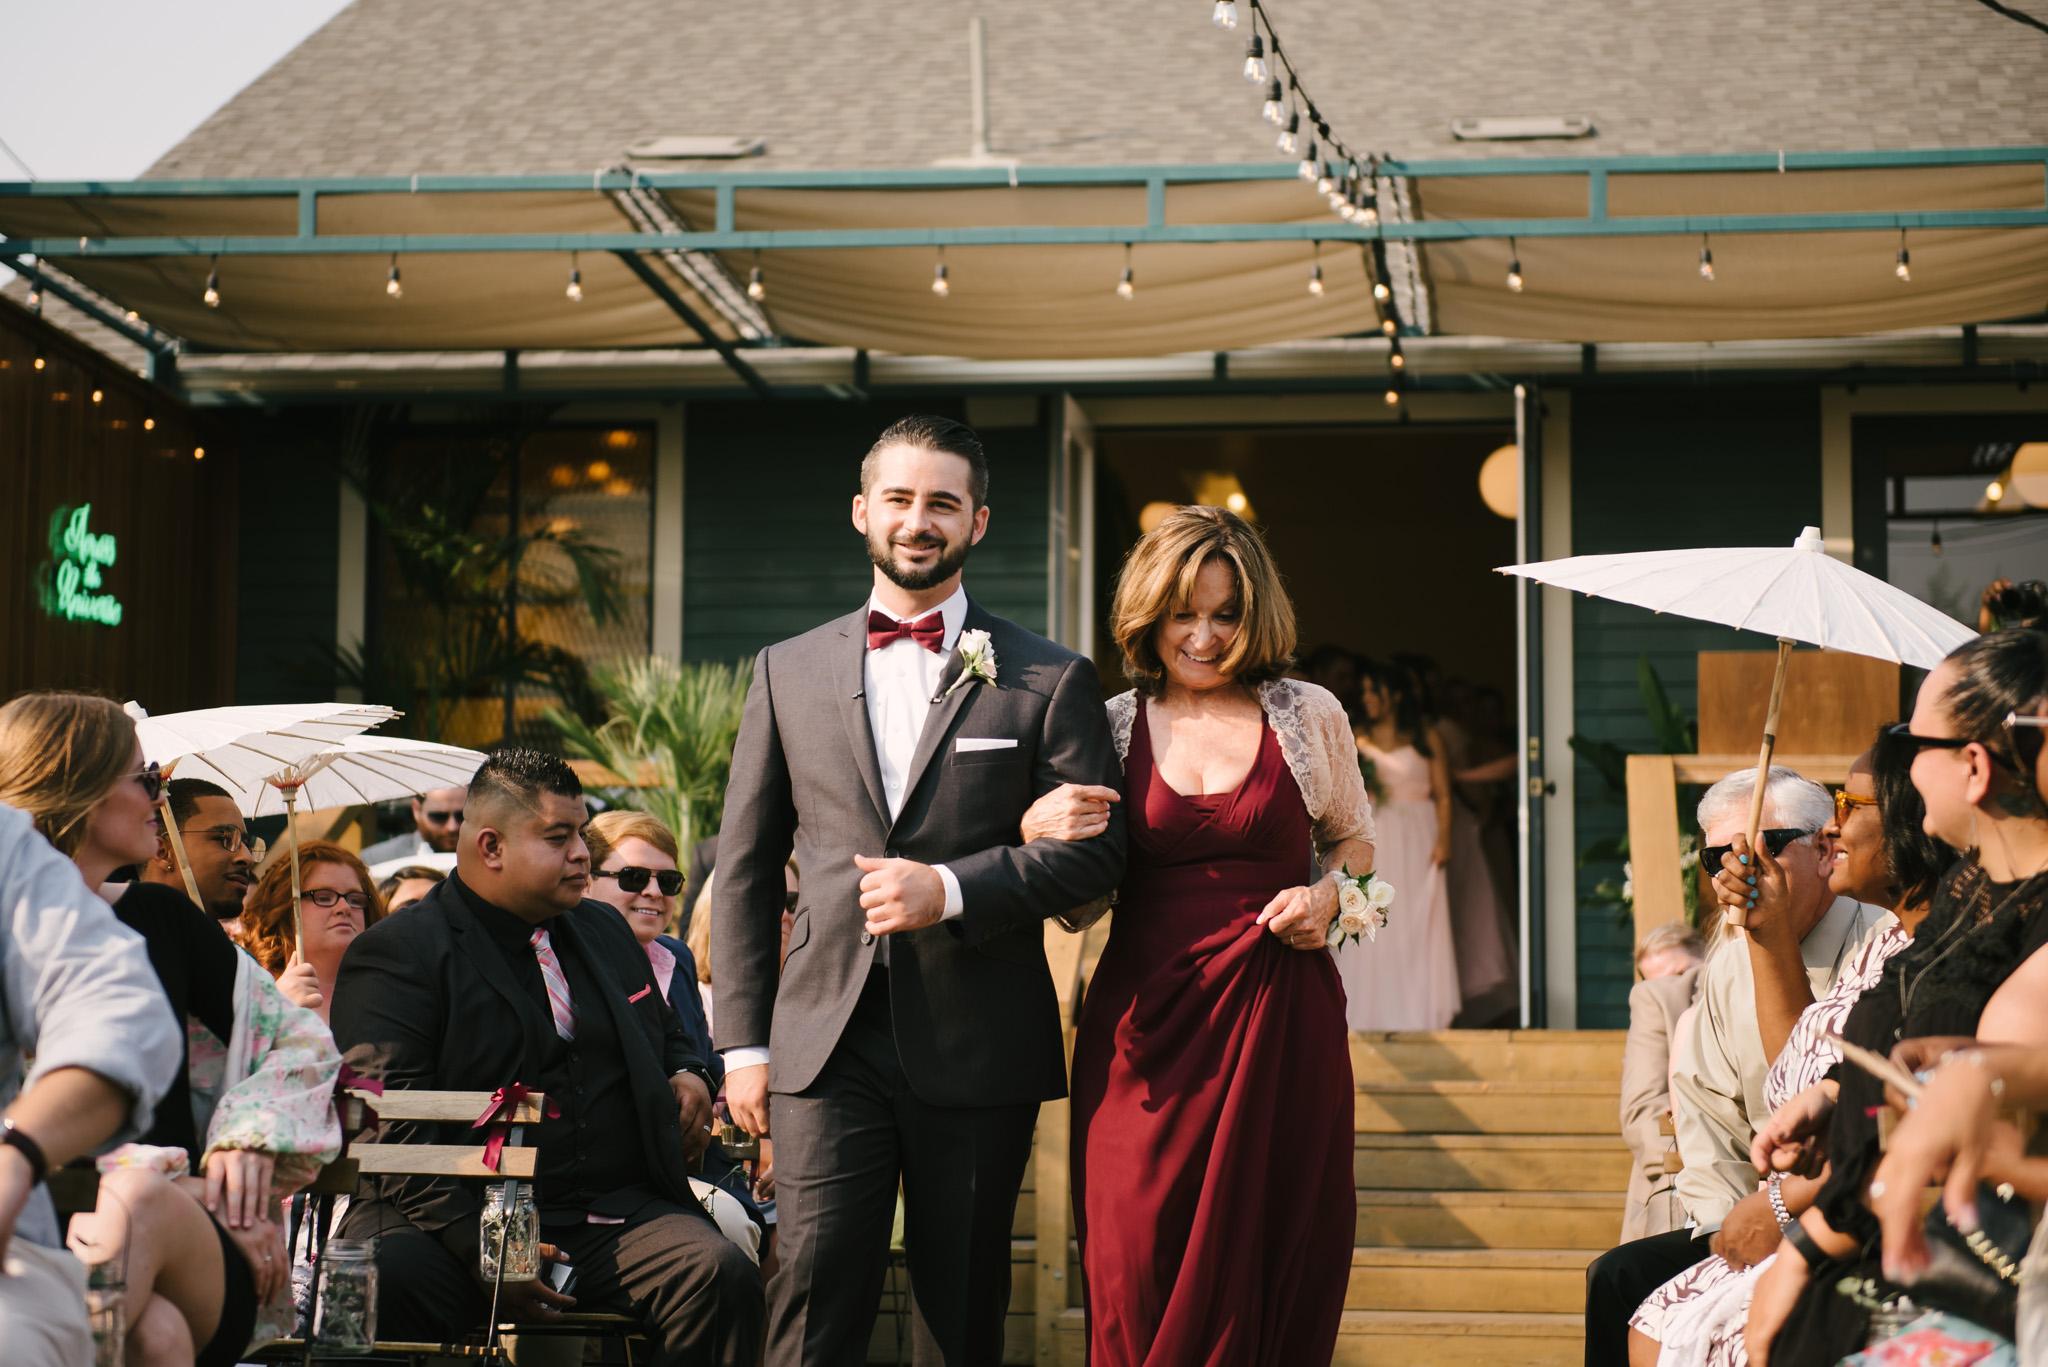 0233-LJ-The-Ruby-Street-Los-Angeles-County-Wedding-Photography.jpg